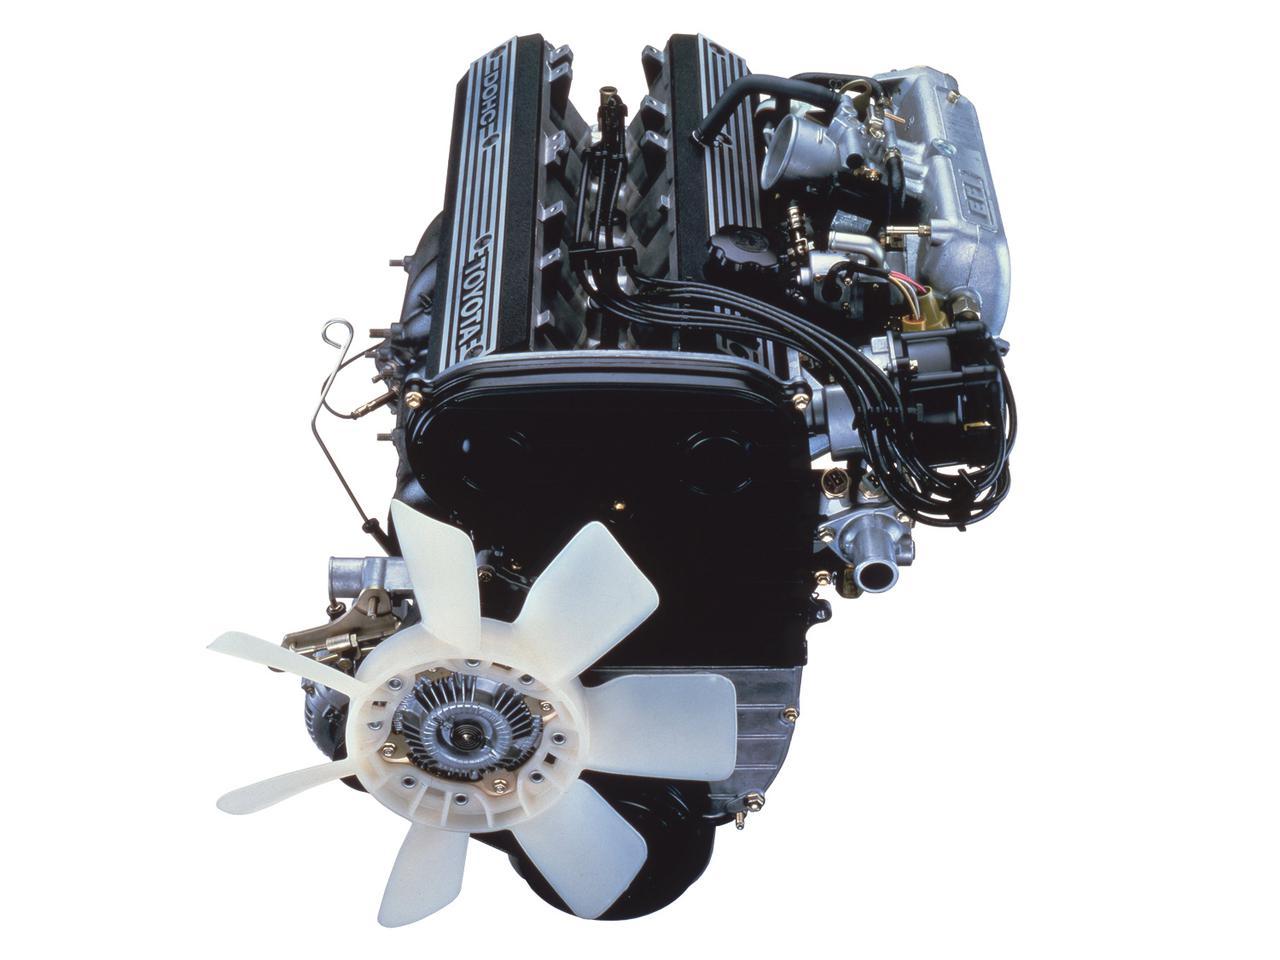 Images : 1番目の画像 - 新時代を切り拓いた初代ソアラと5M-GEU型エンジン - LAWRENCE - Motorcycle x Cars + α = Your Life.